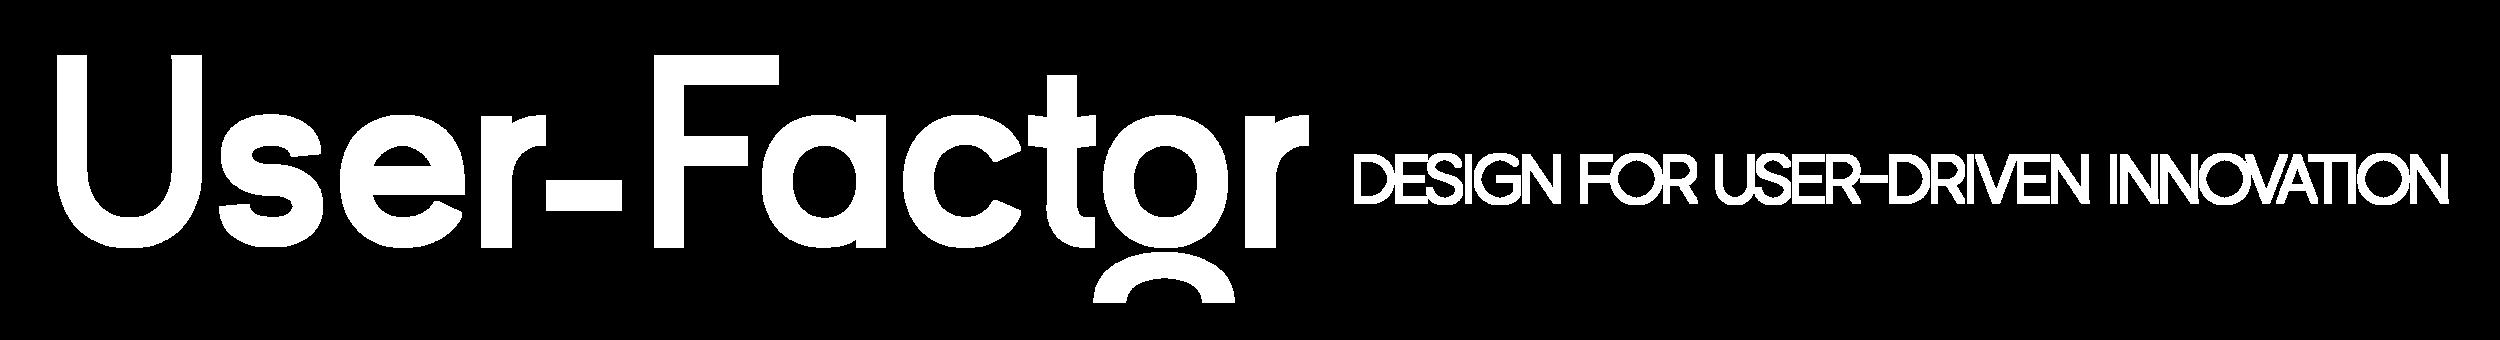 Logo-userfactor-full-white (1).png